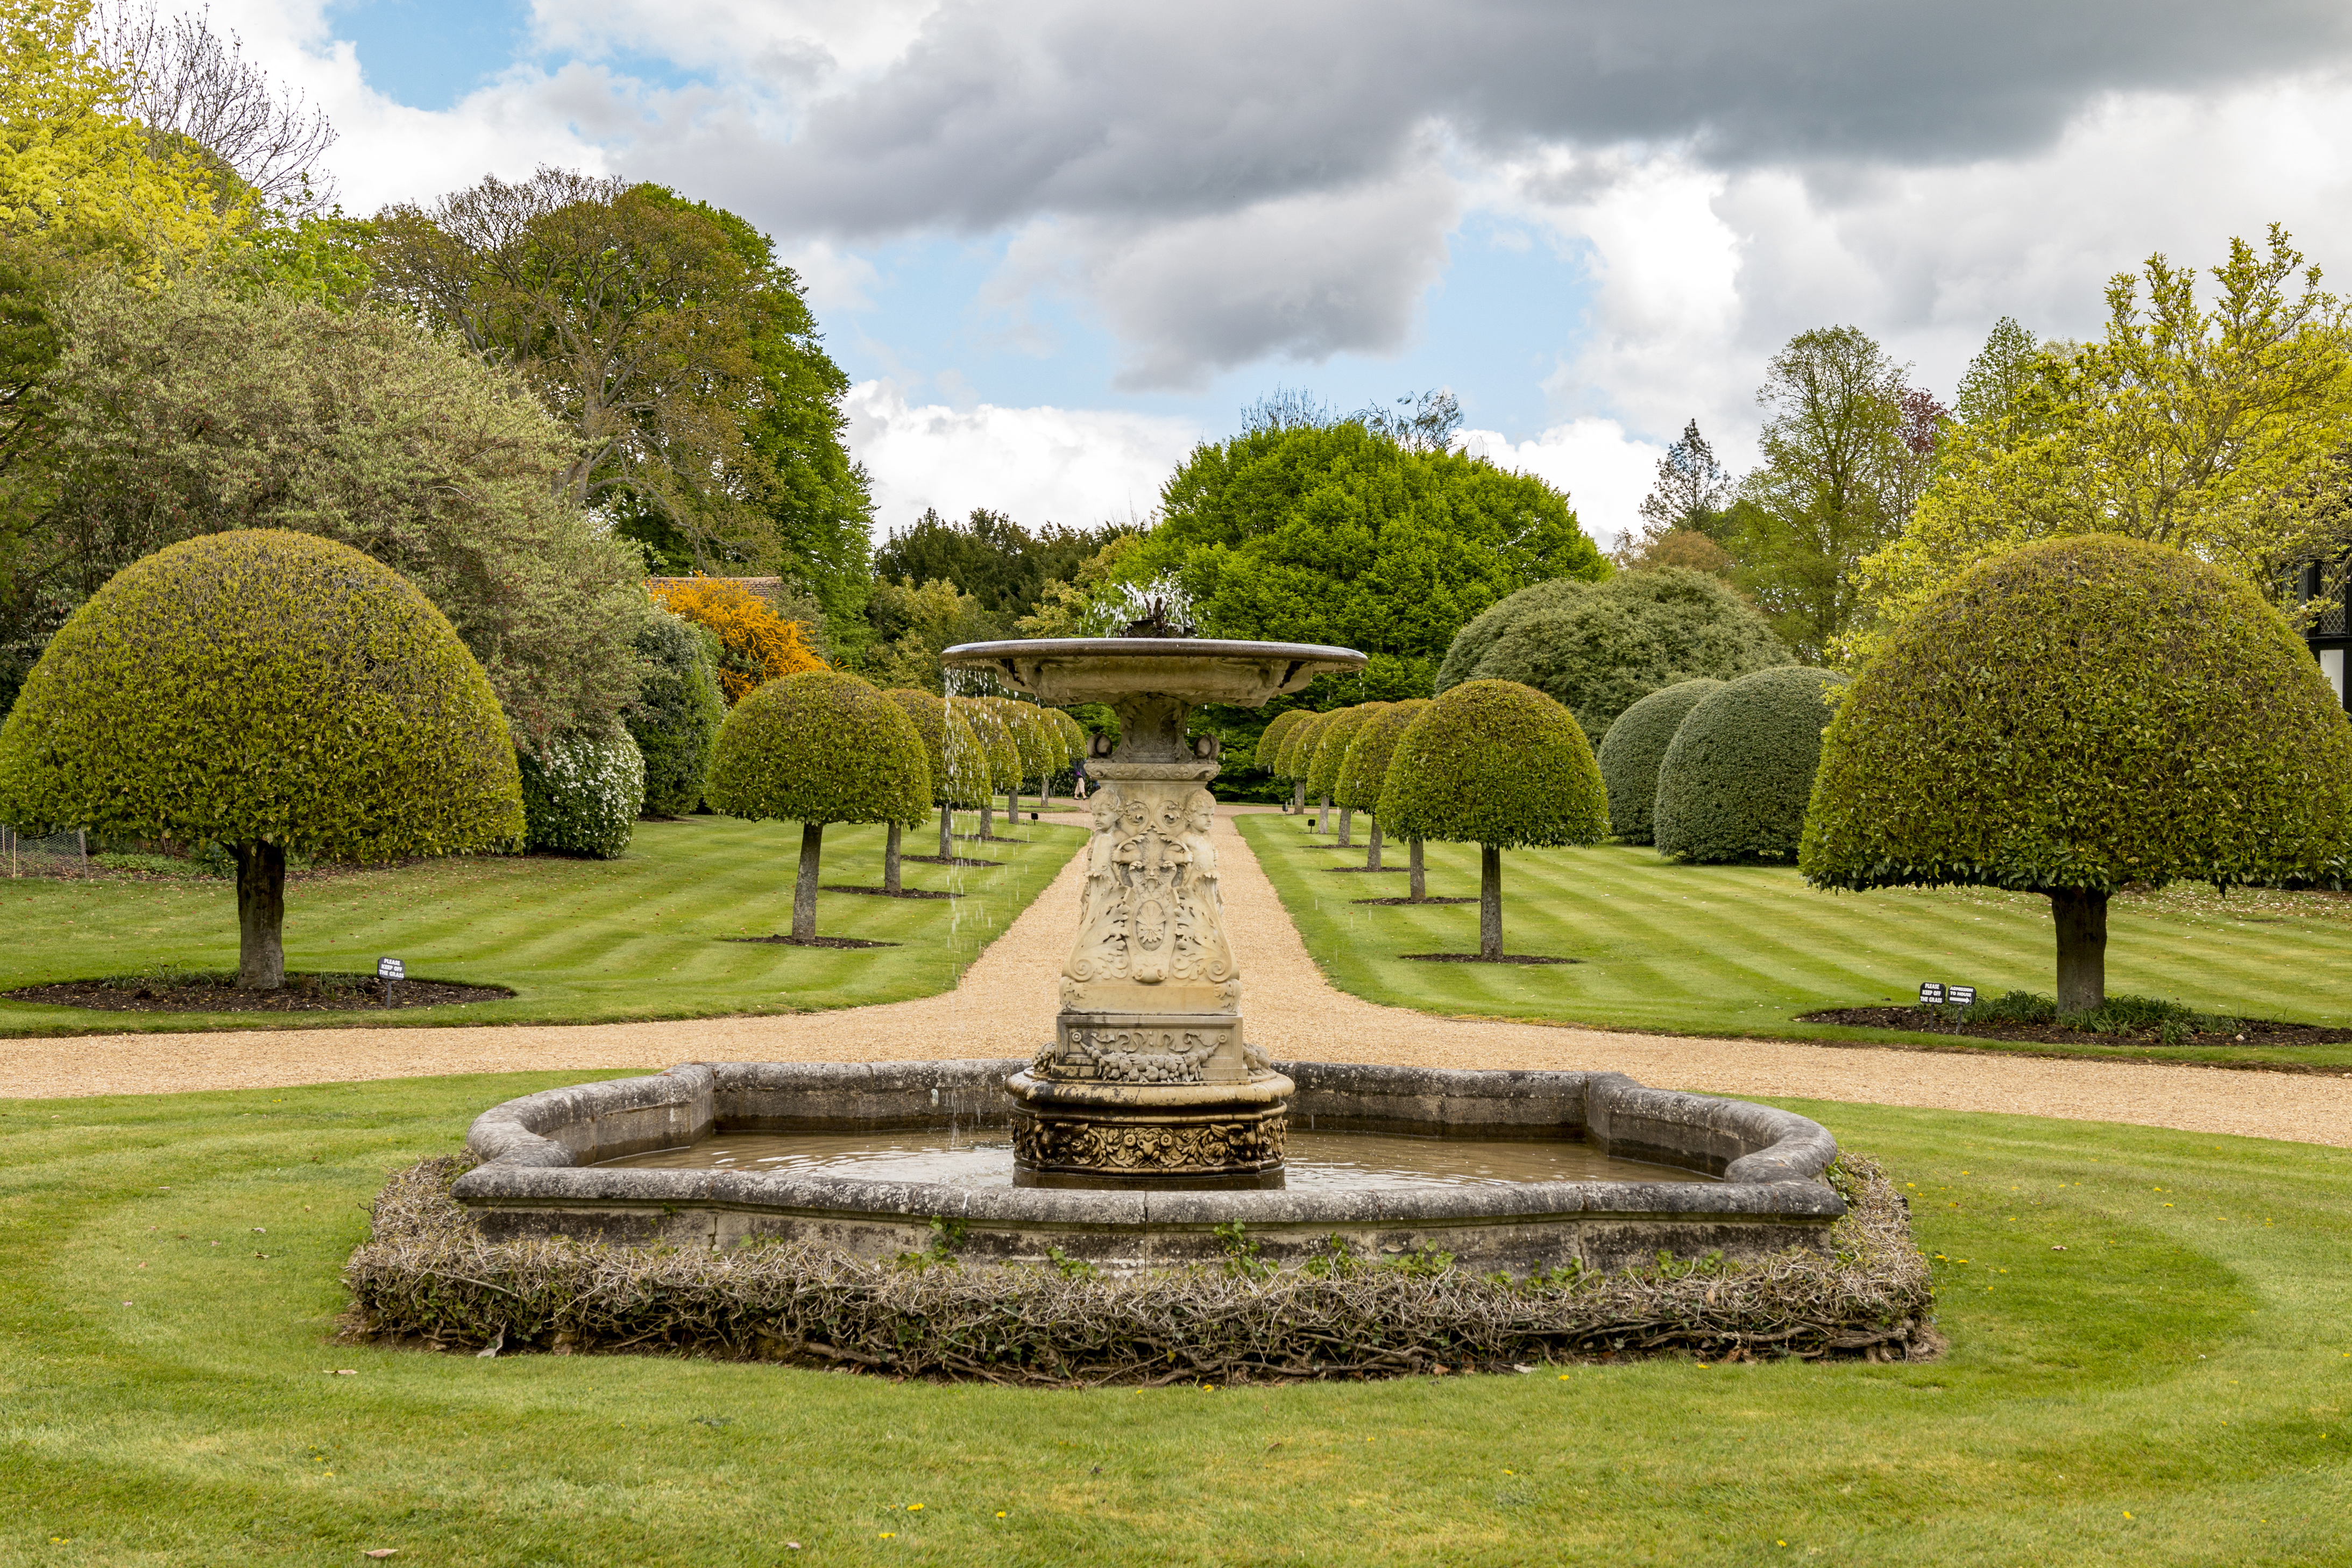 4372x2915 Reino Unido Jardíns Fuente Ascott House gardens Diseño árboles Césped Naturaleza